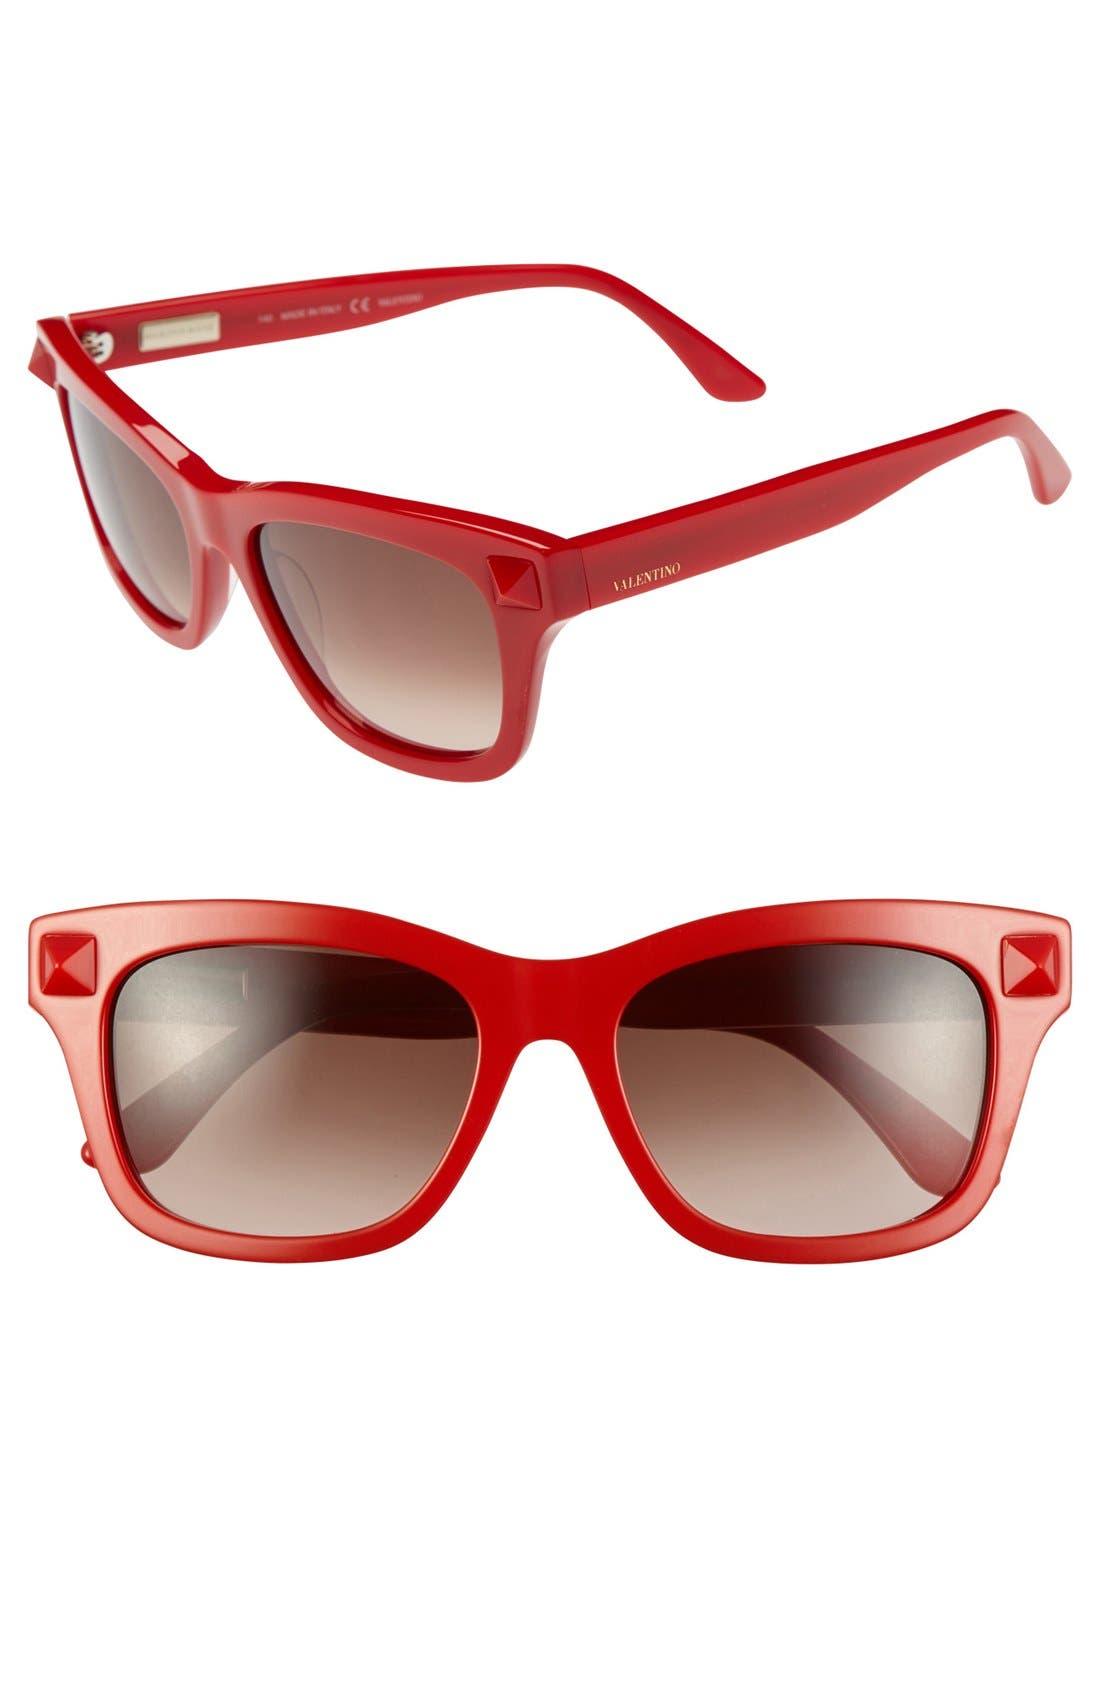 Main Image - Valentino 'Rockstud Rouge' 53mm Sunglasses